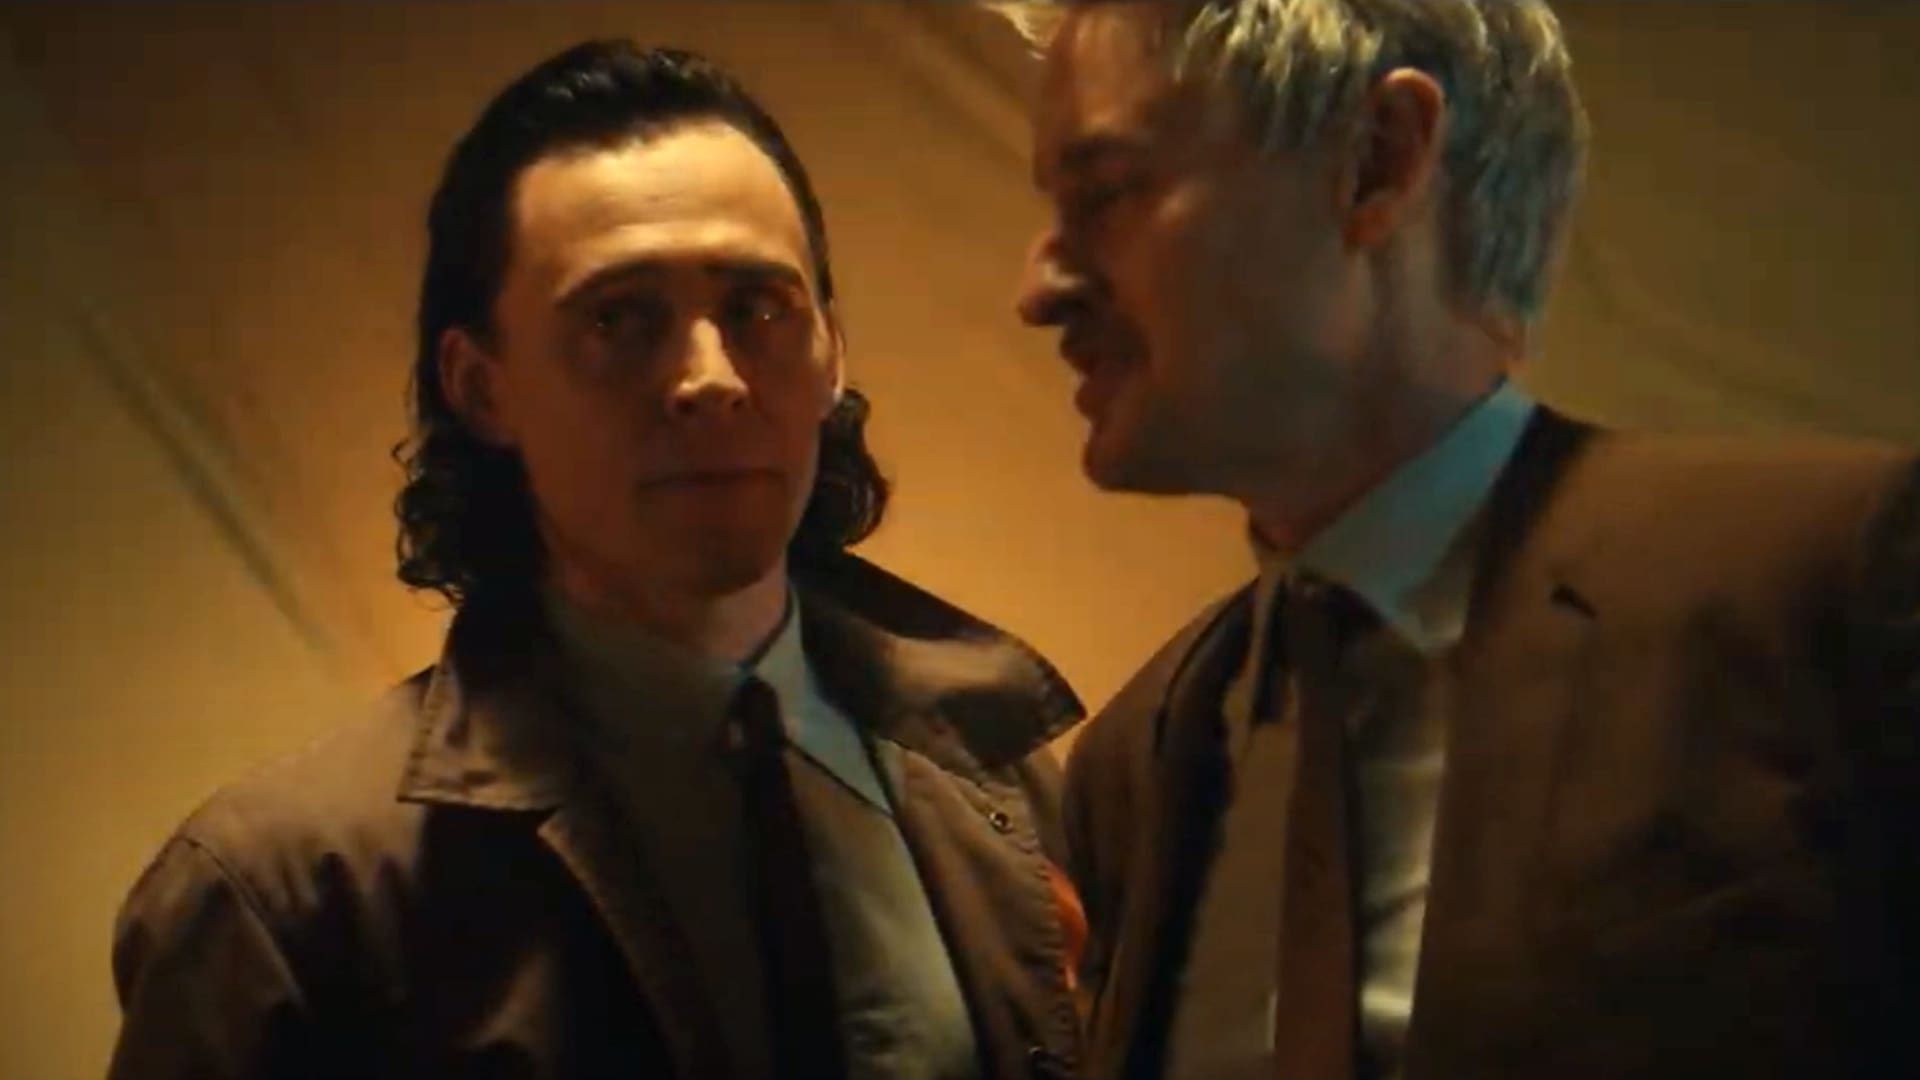 Tom Hiddleston and Owen Wilson star in Marvel Studios' Loki on Disney Plus